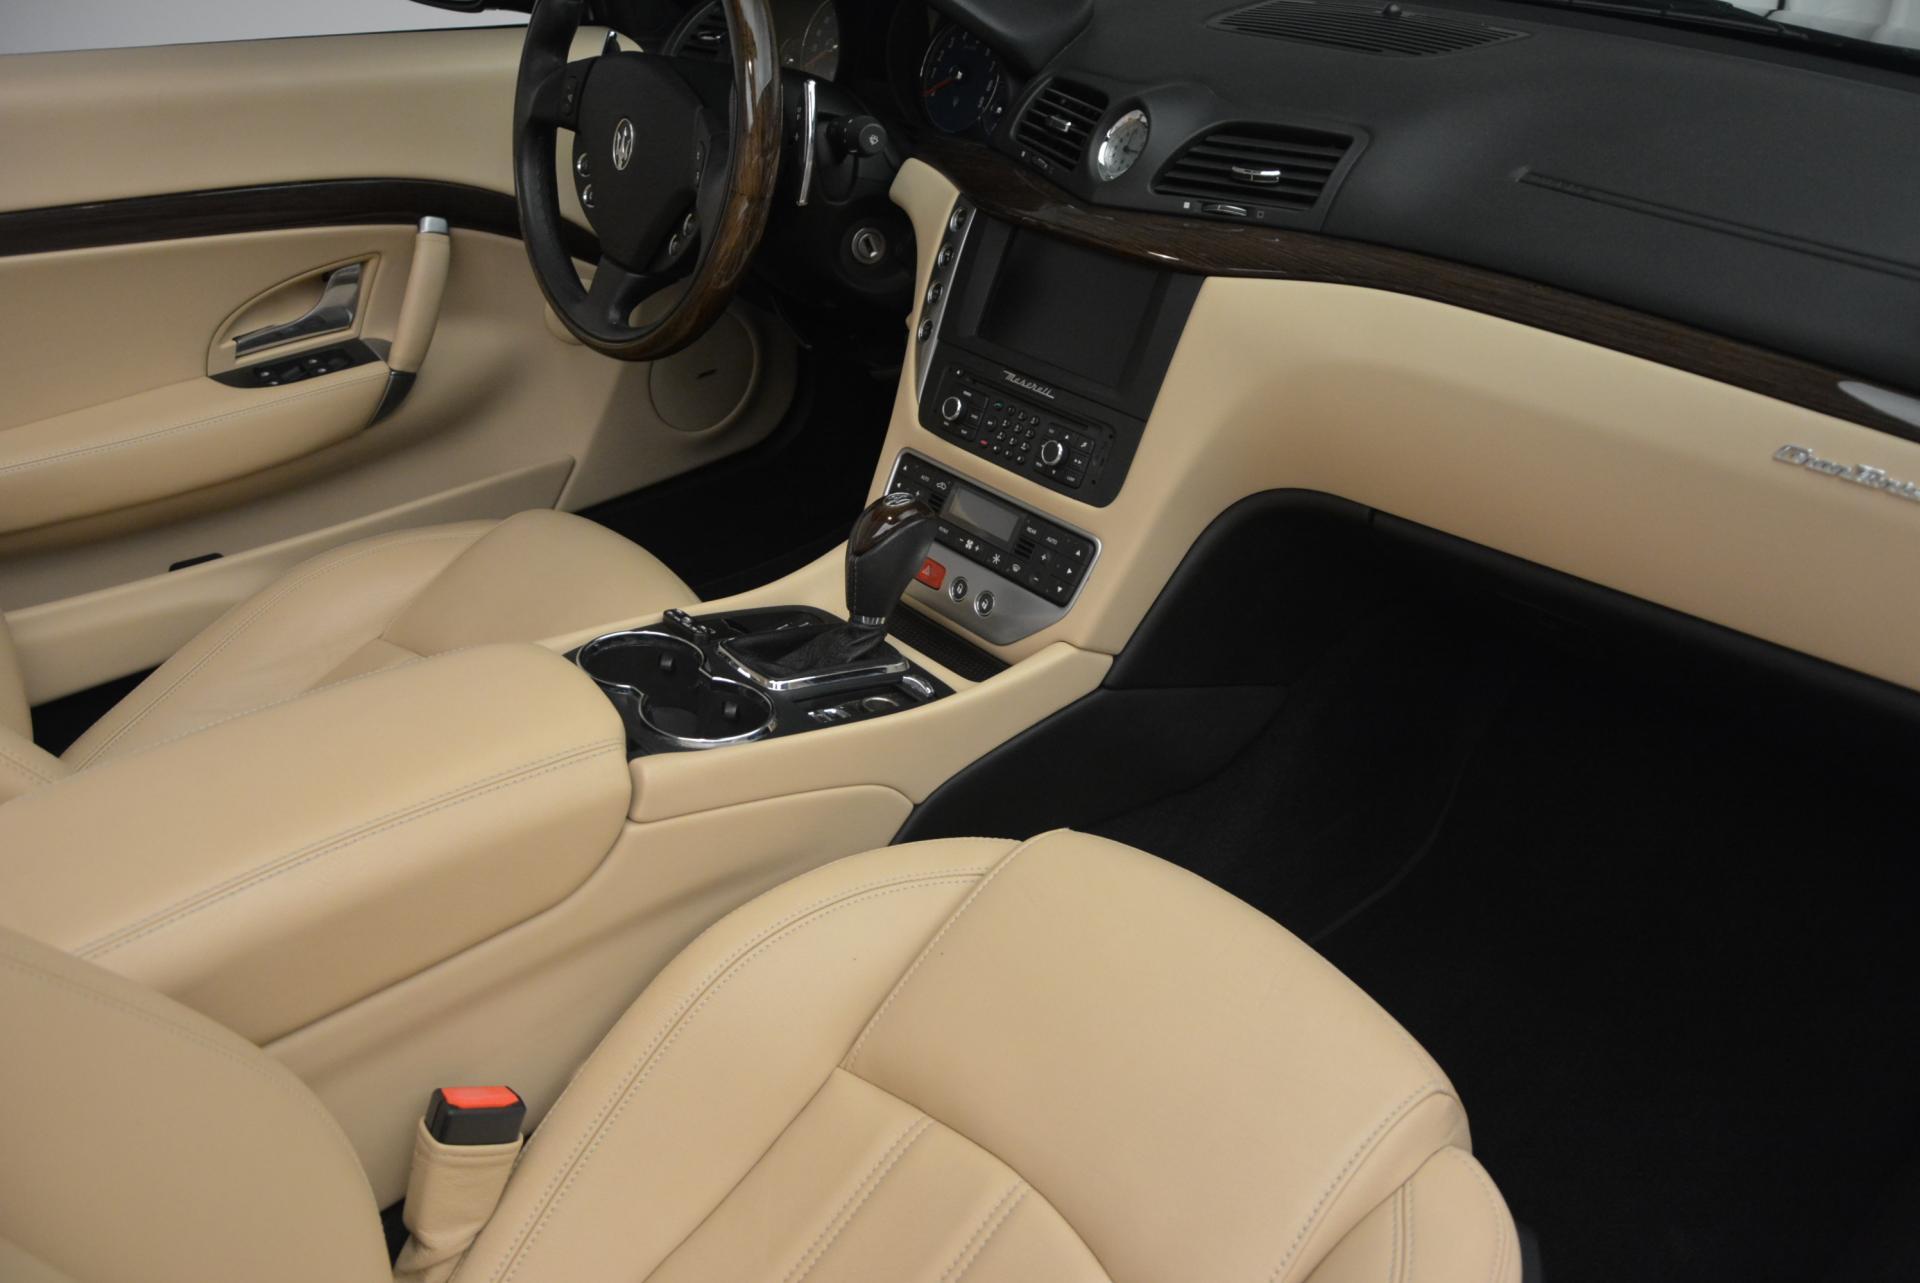 Used 2011 Maserati GranTurismo Base For Sale In Westport, CT 158_p31